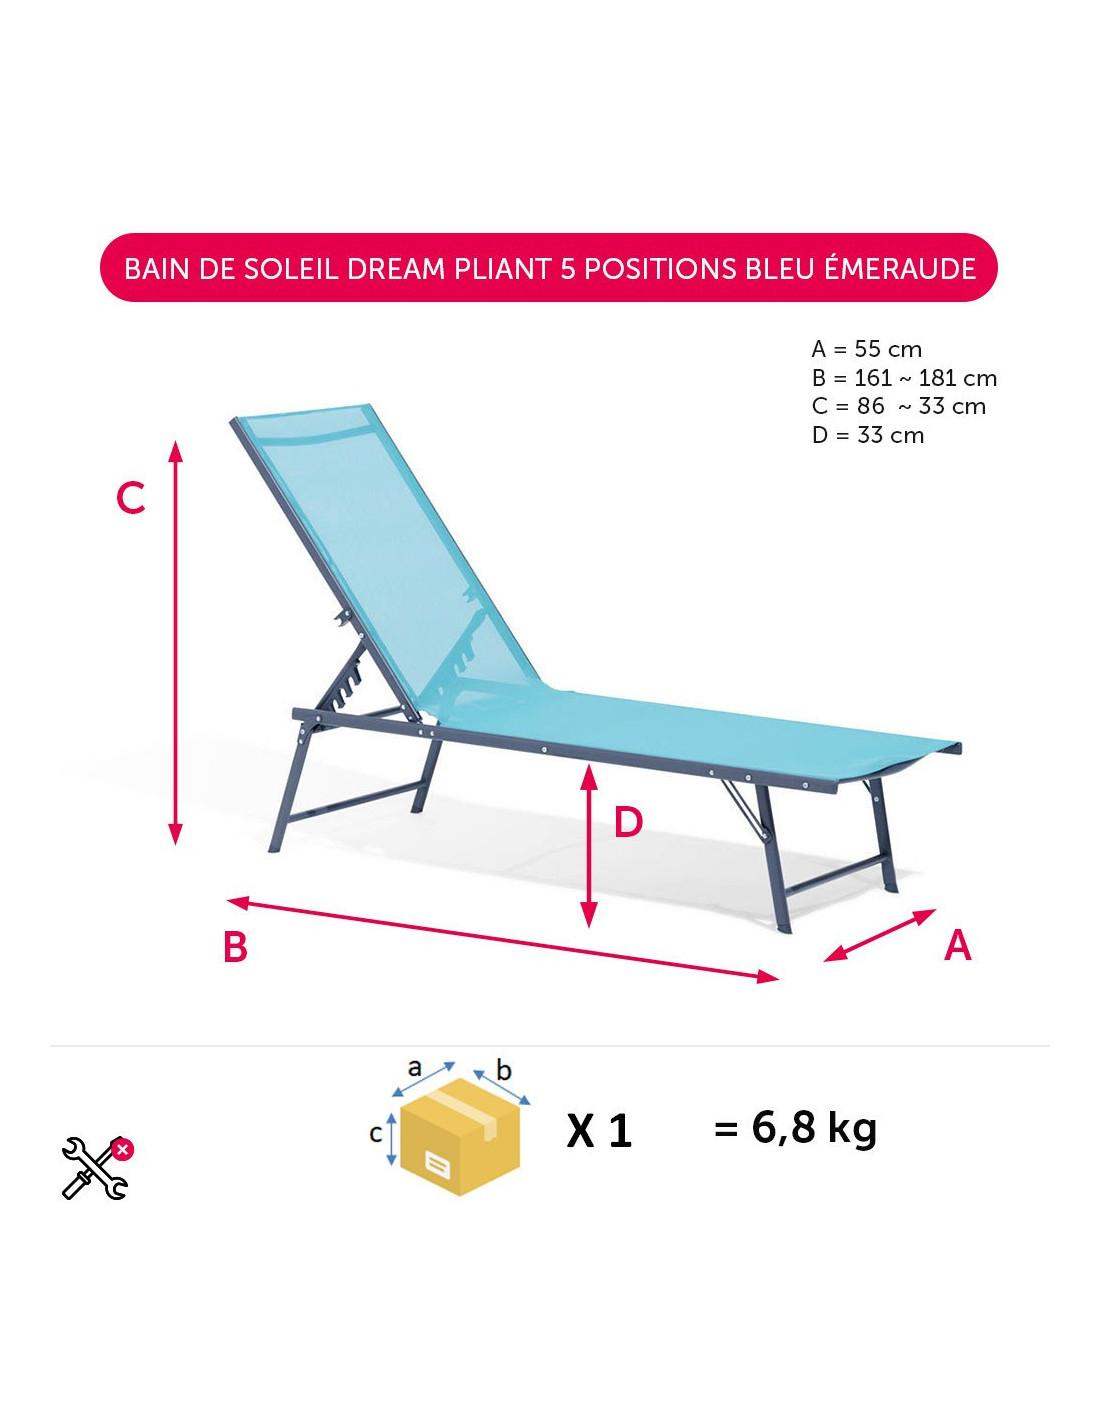 Diffusion Bain De Soleil Dream Pliant 5 Positions Bleu ... dedans Bain De Soleil Dream Pliant